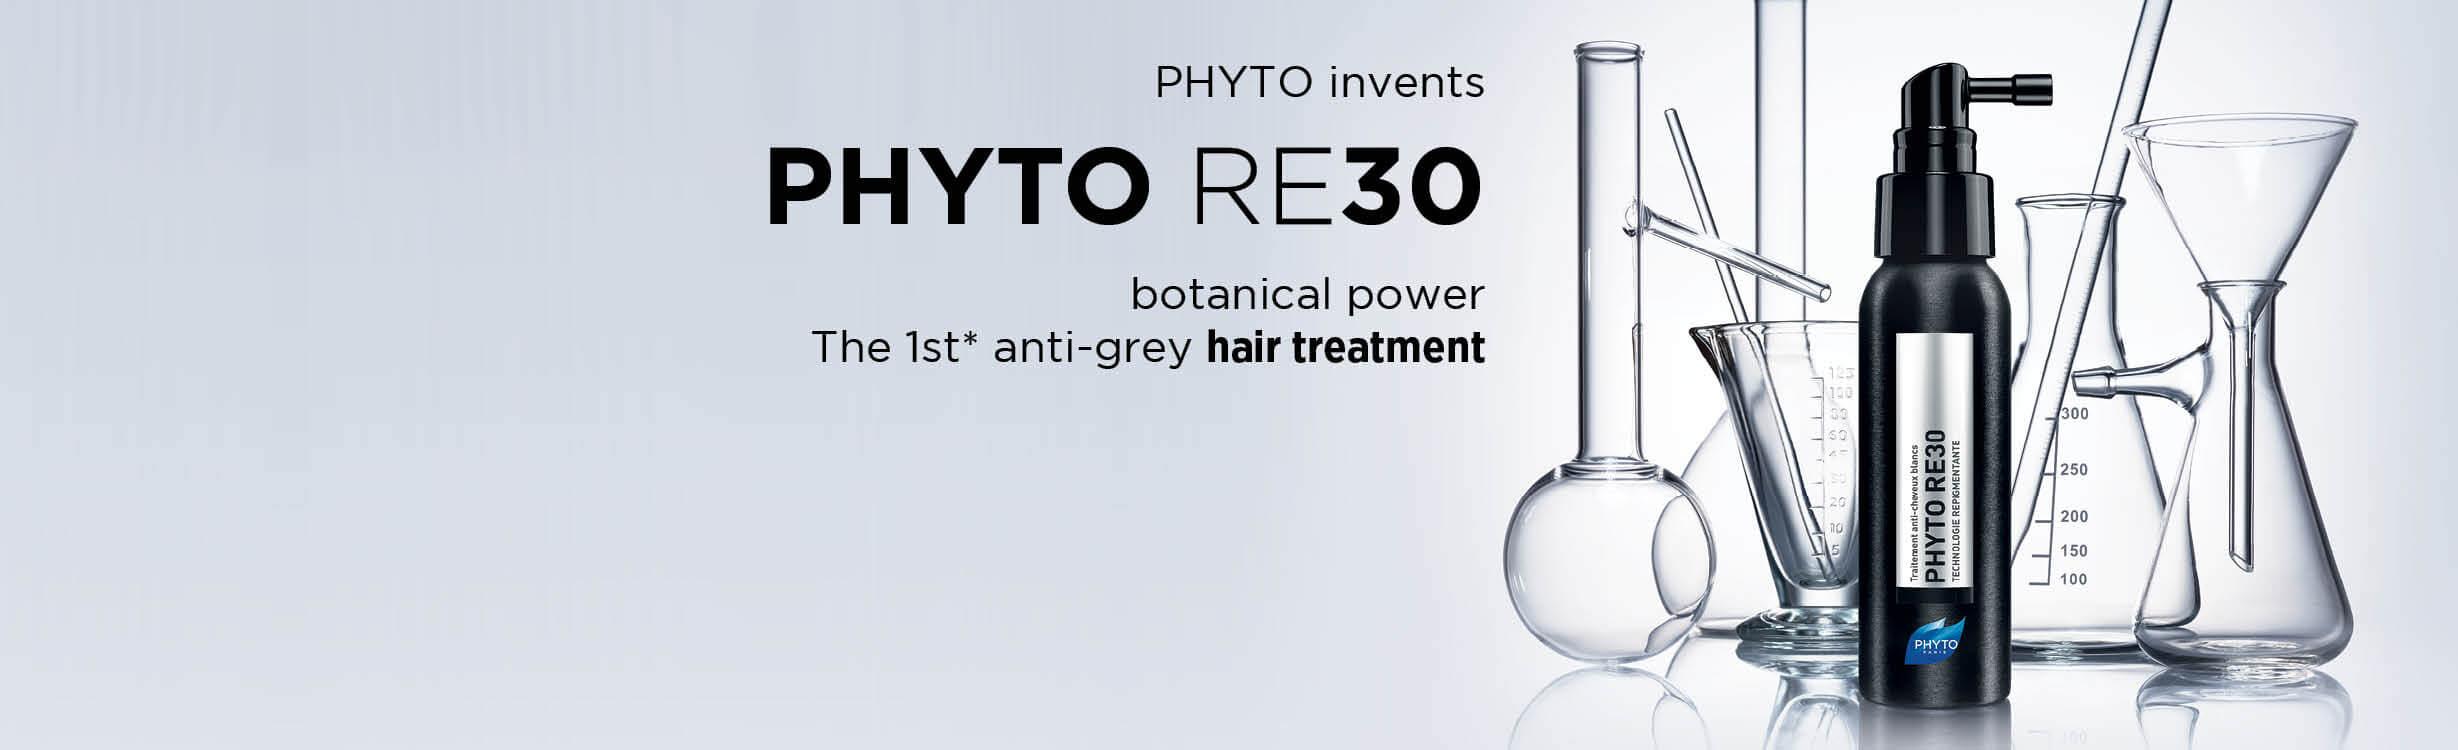 /brands/phyto/all-phyto.list